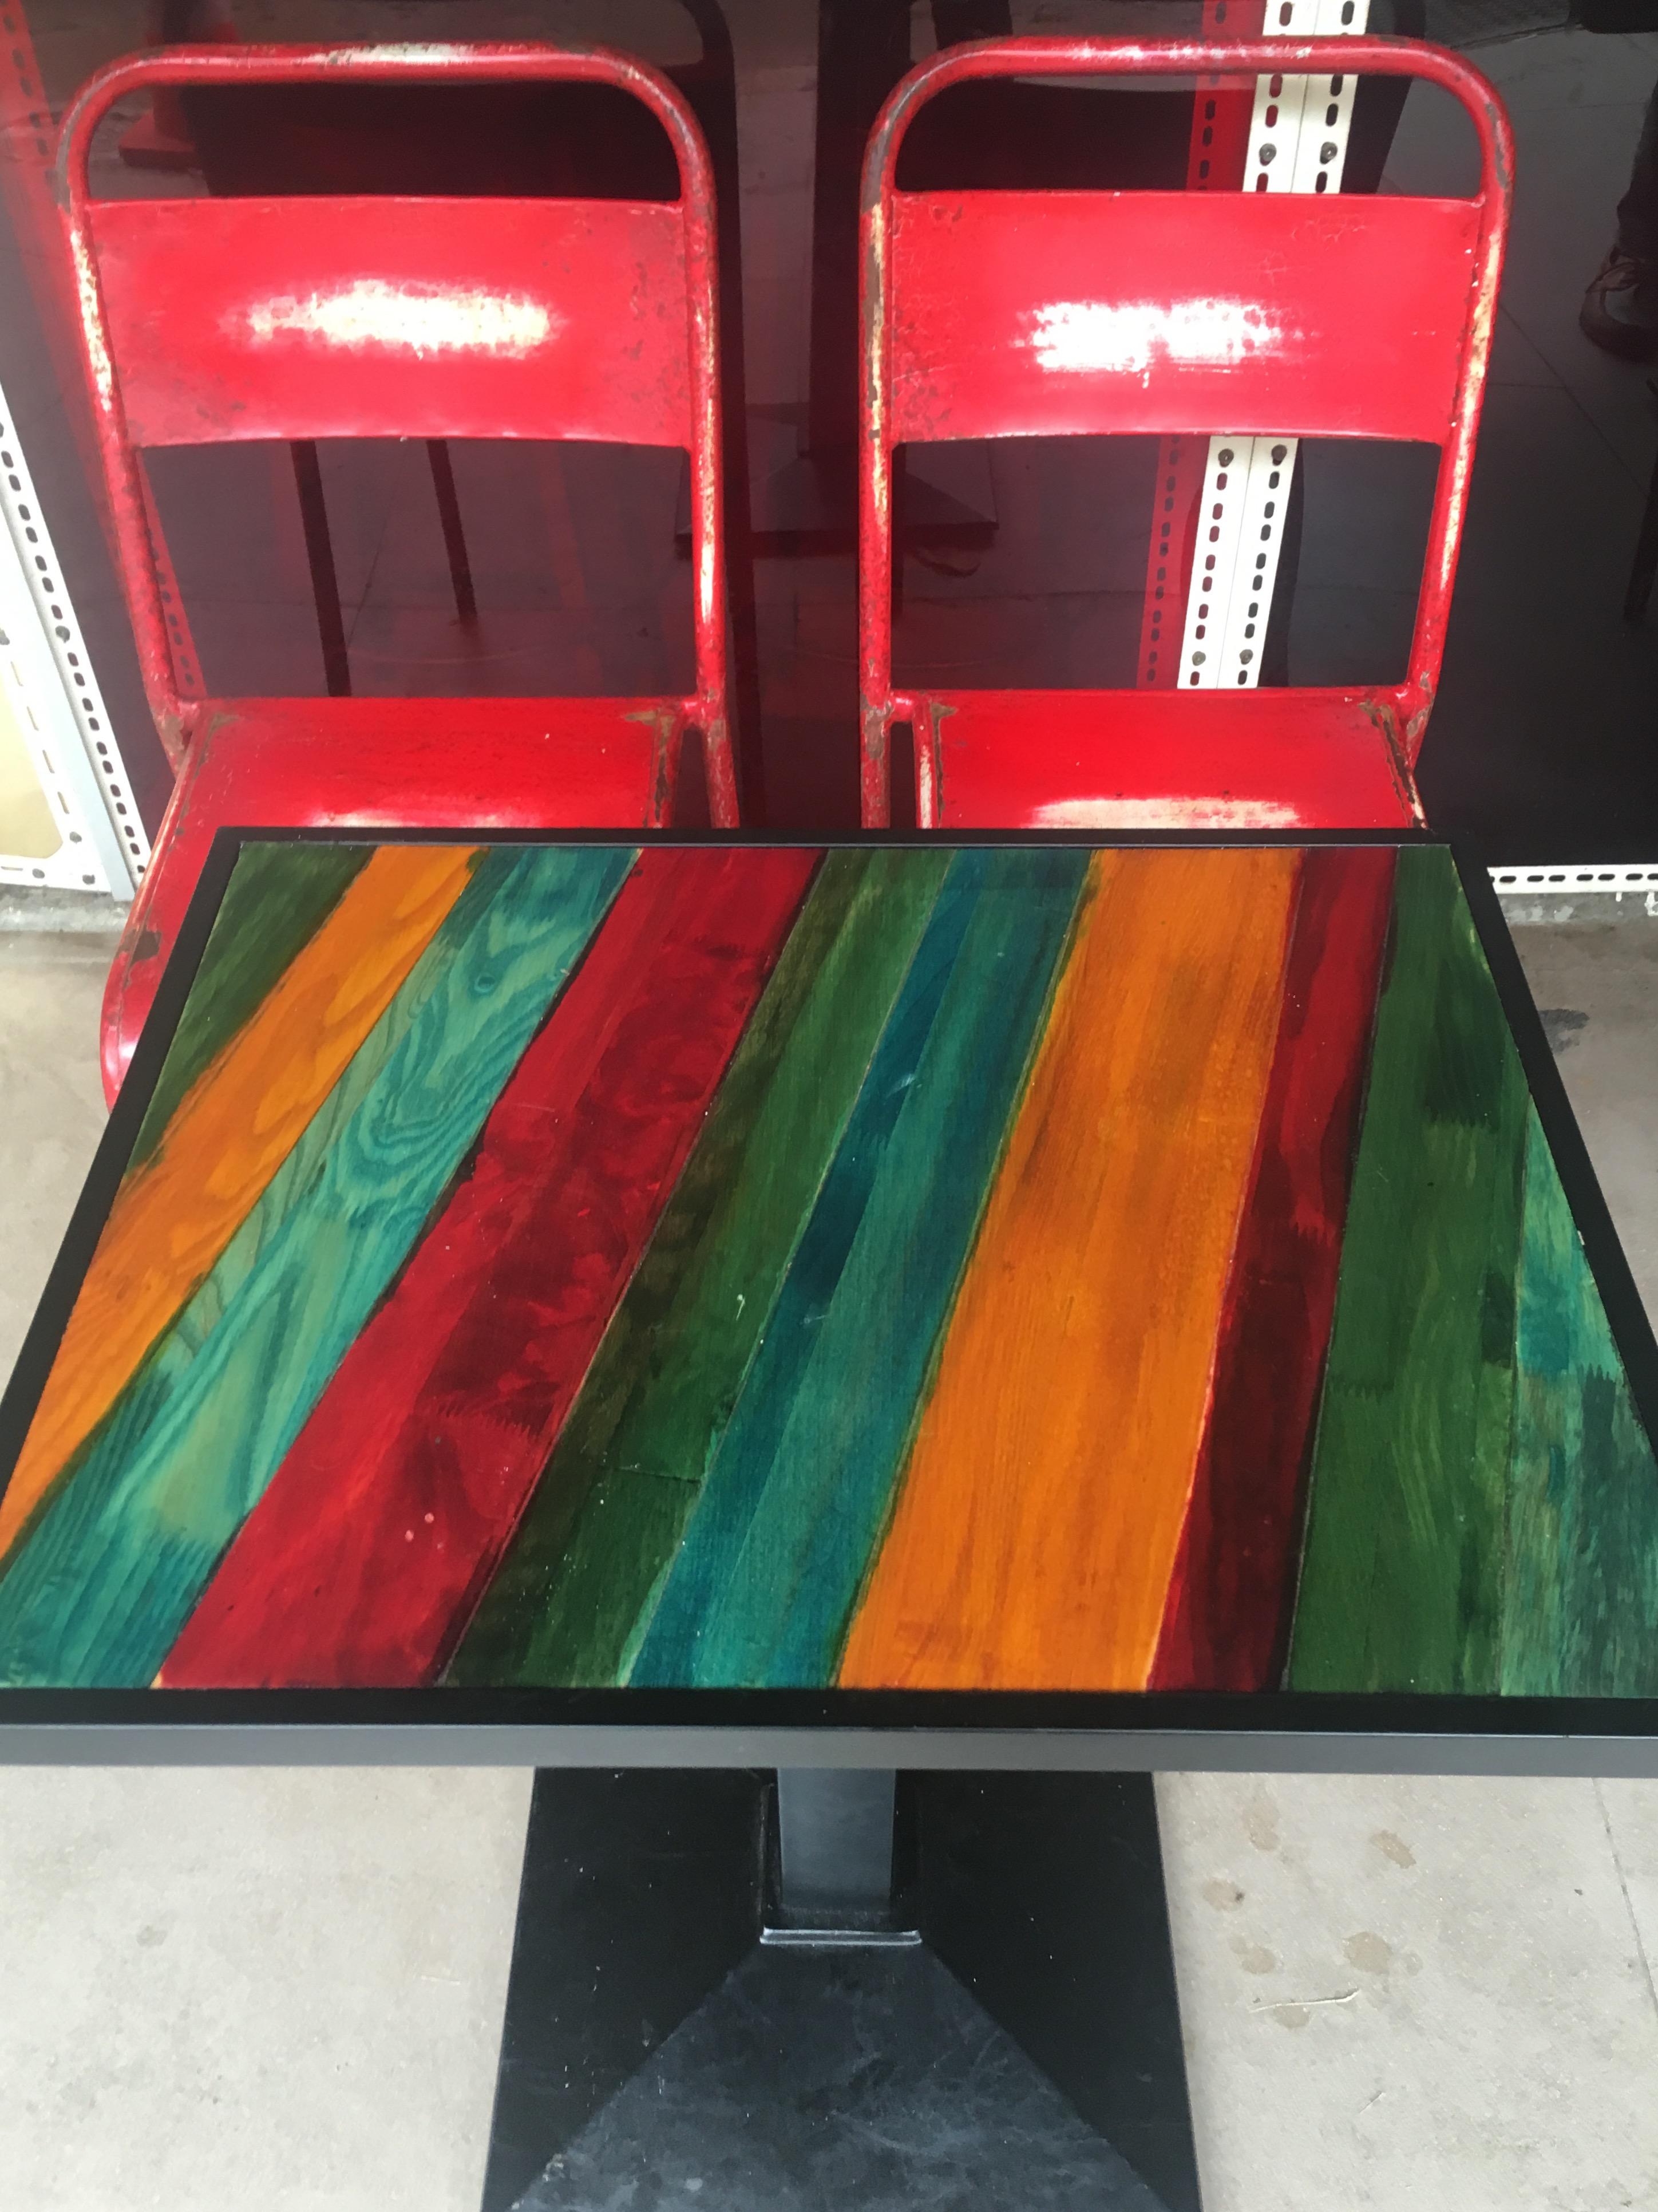 The Bravery Café - Outdoor Table